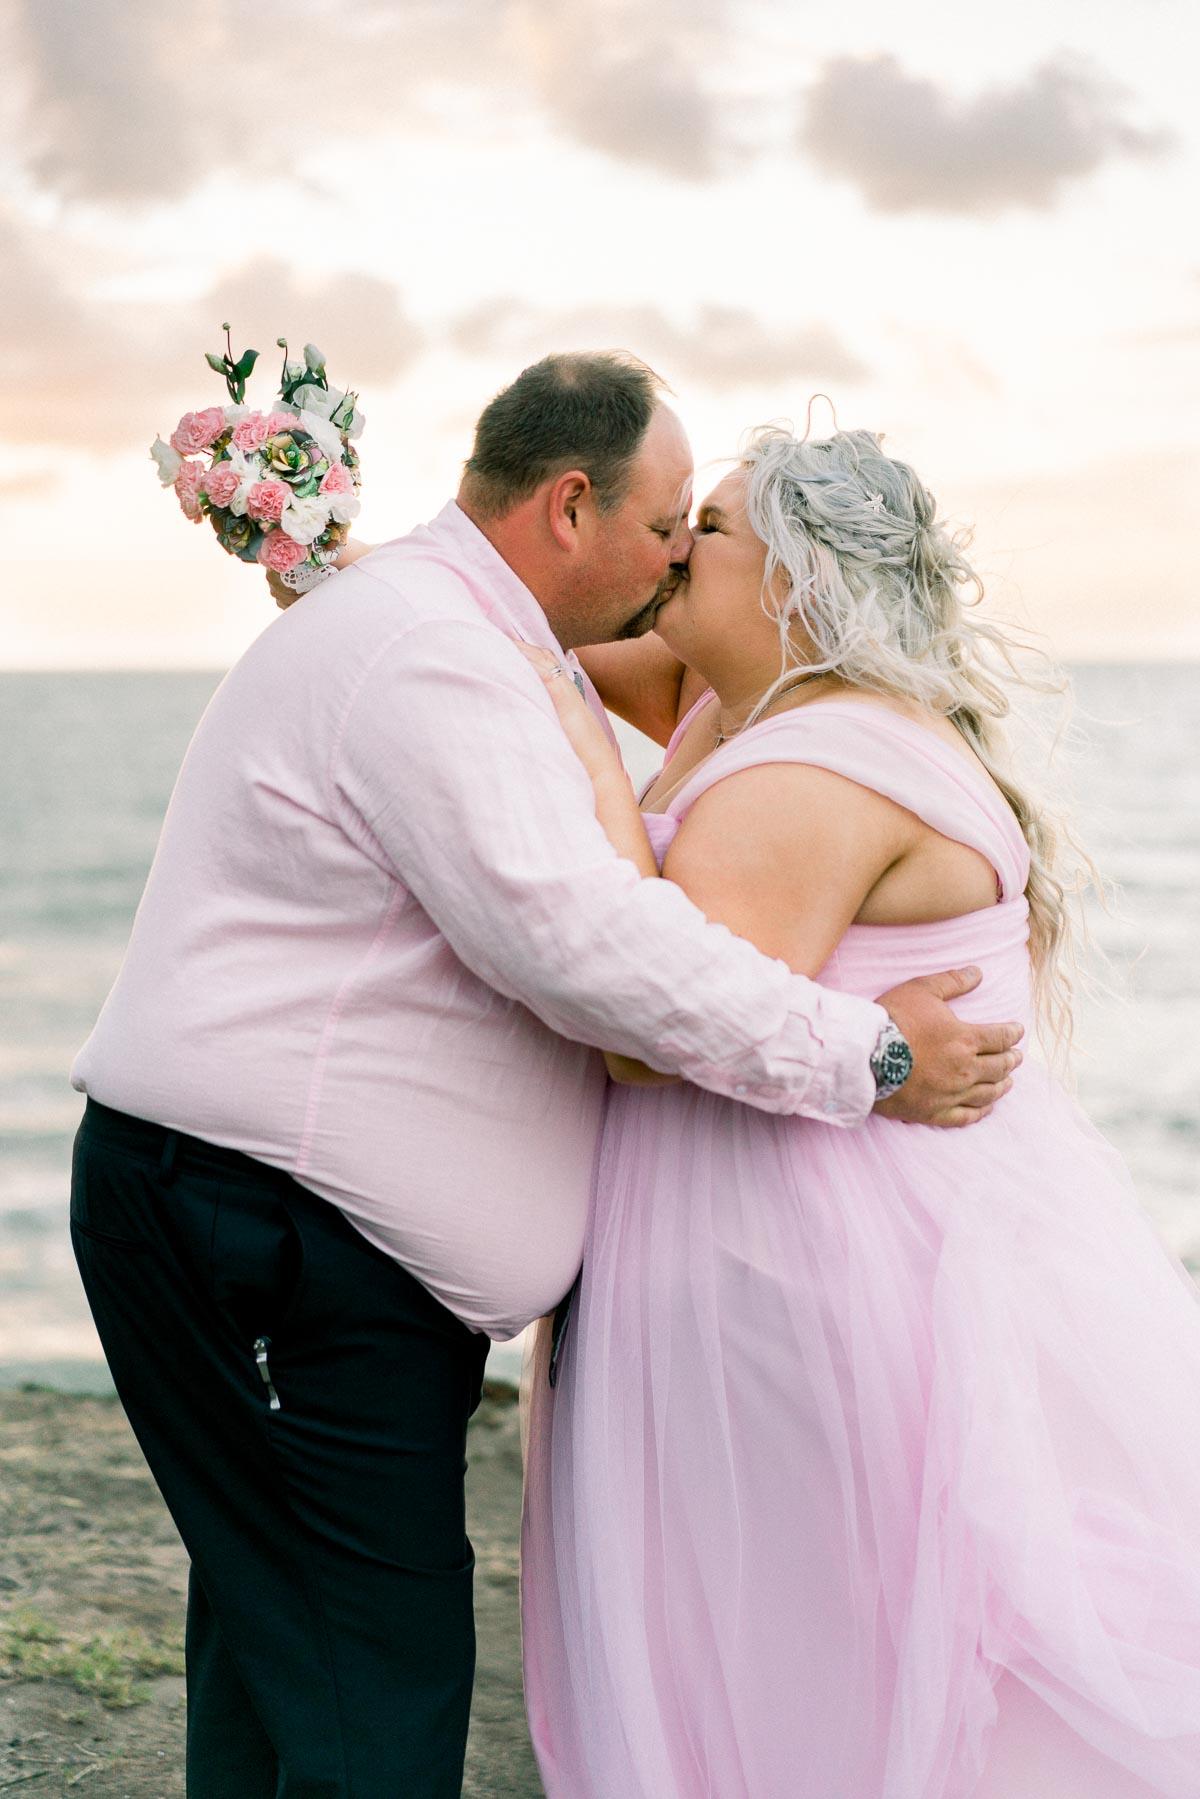 mt-eliza-mornington-peninsula-backyard-wedding-heart+soul-weddings-allison-matt-04115.jpg